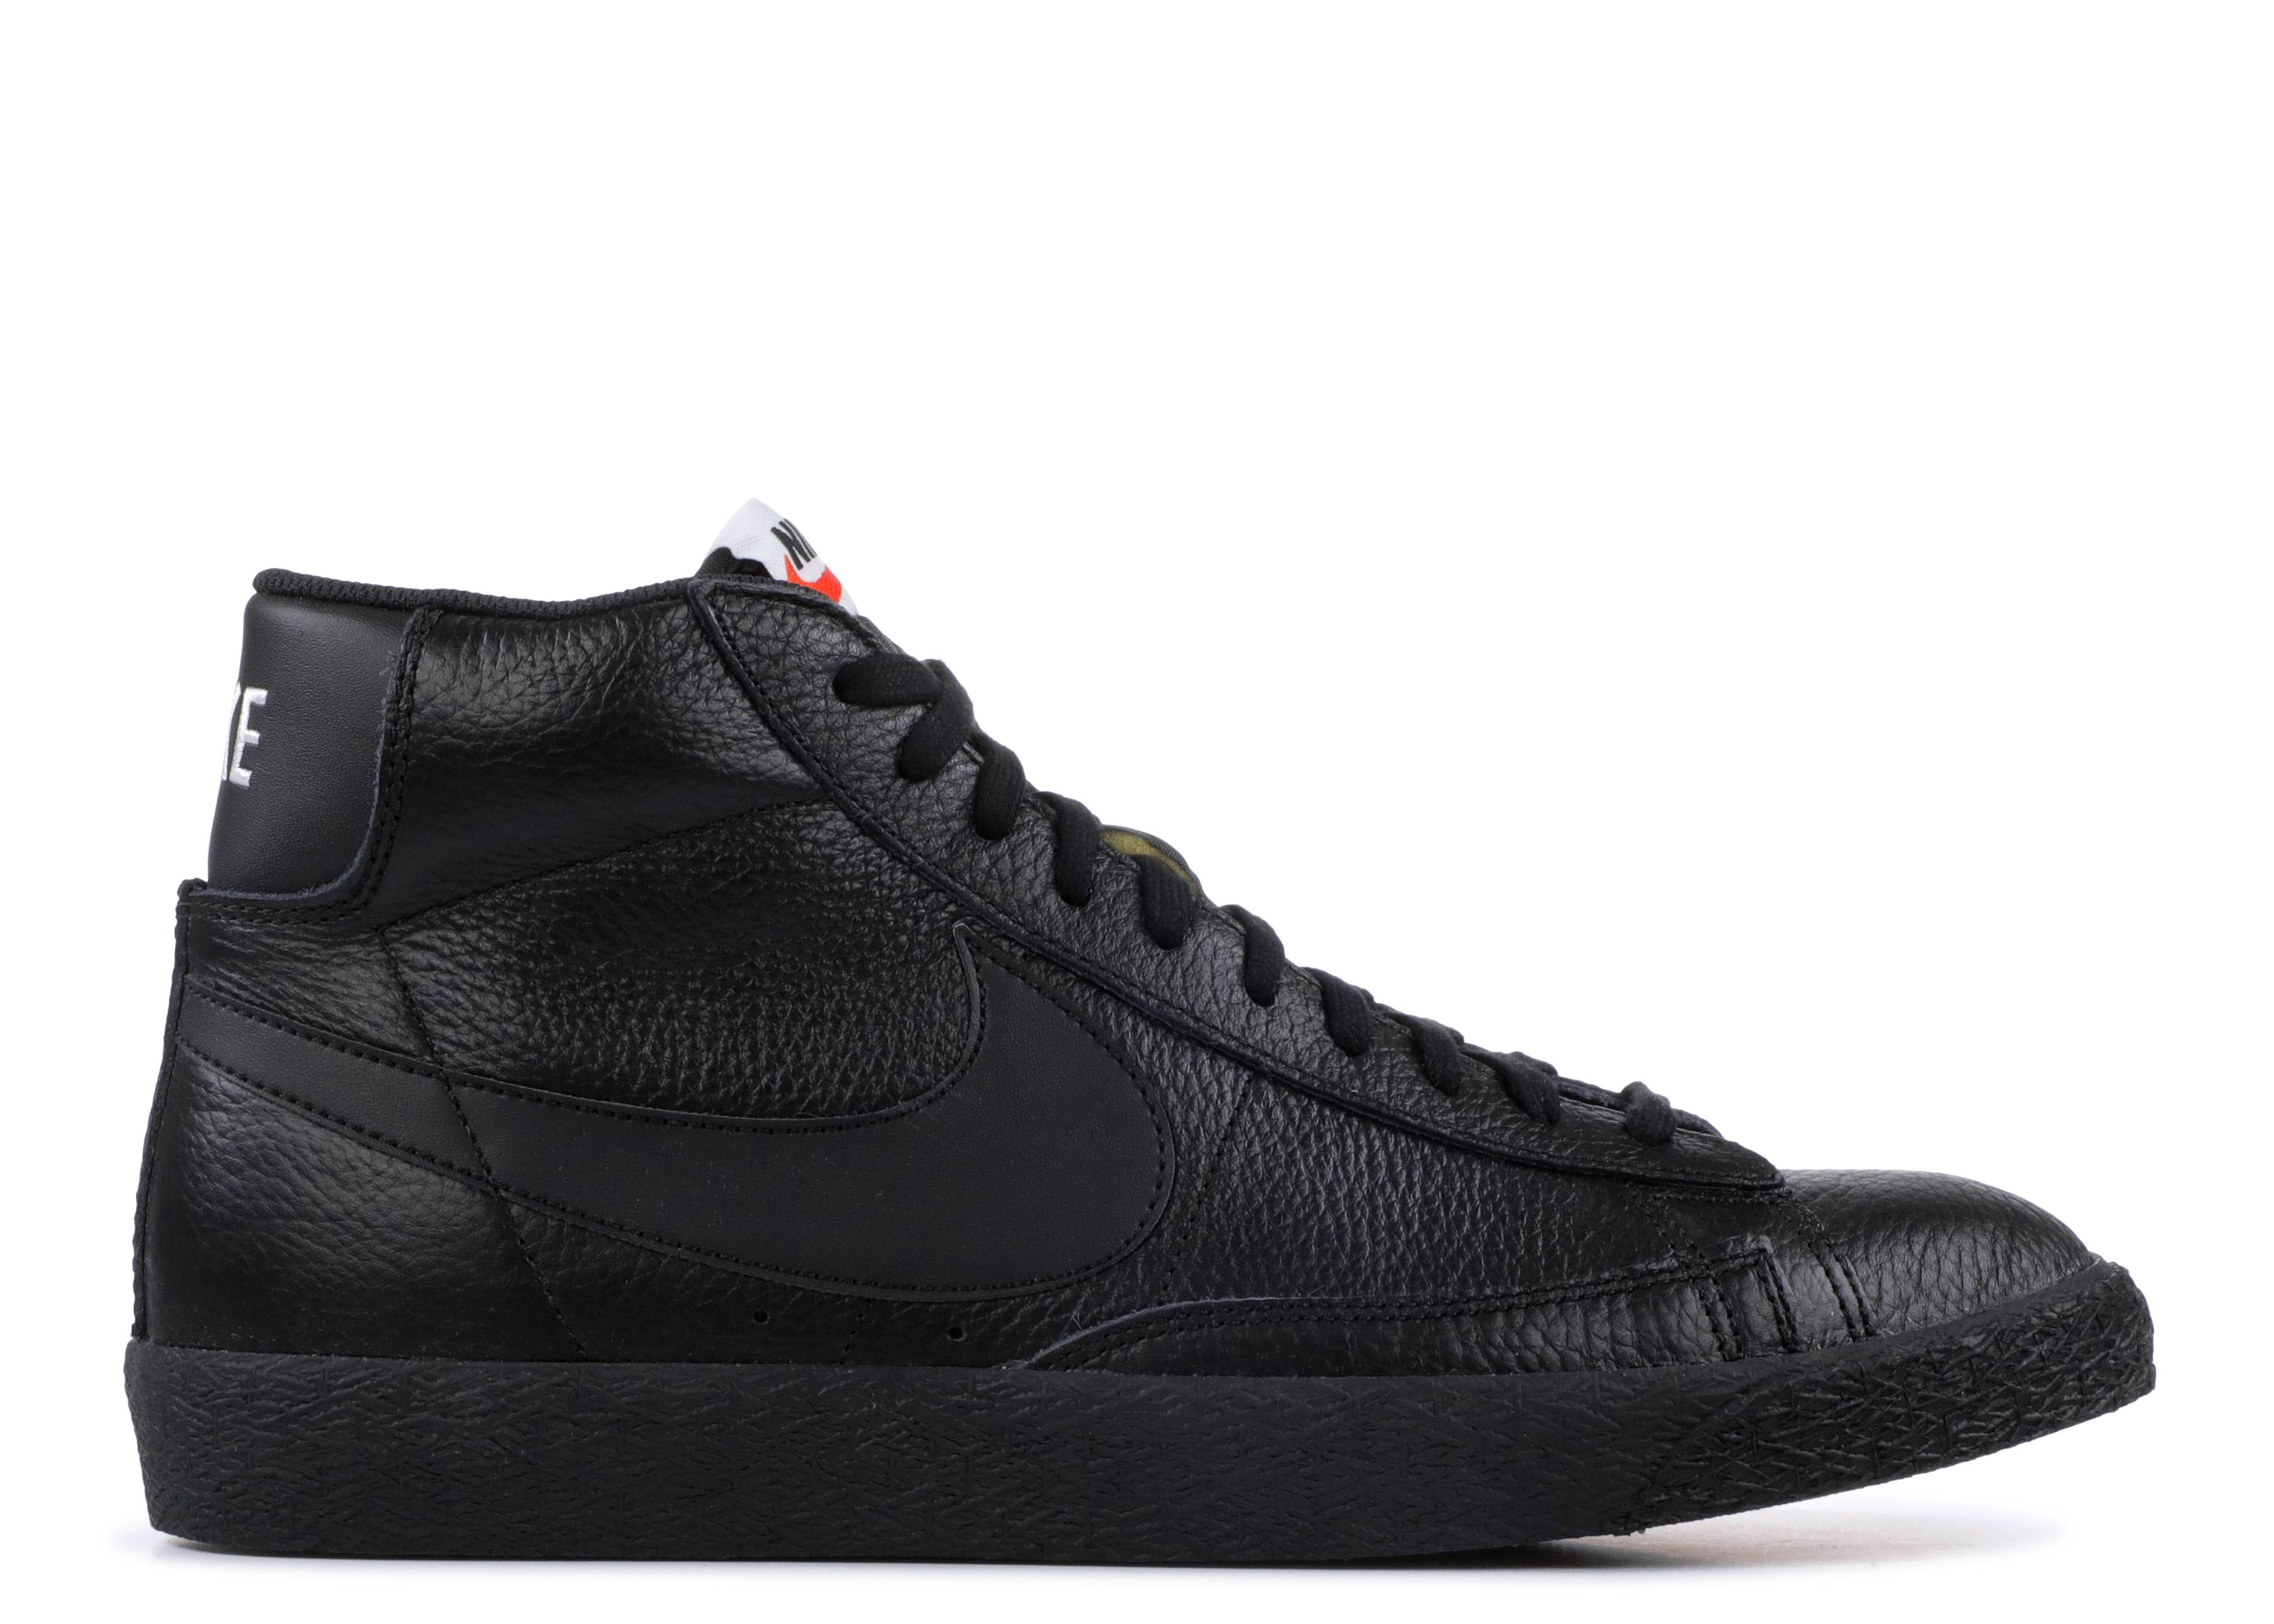 Blazer Nike Mid Prm Nike Blazer 429988 007 Noir Noir Blanc Flight Club 3b0252